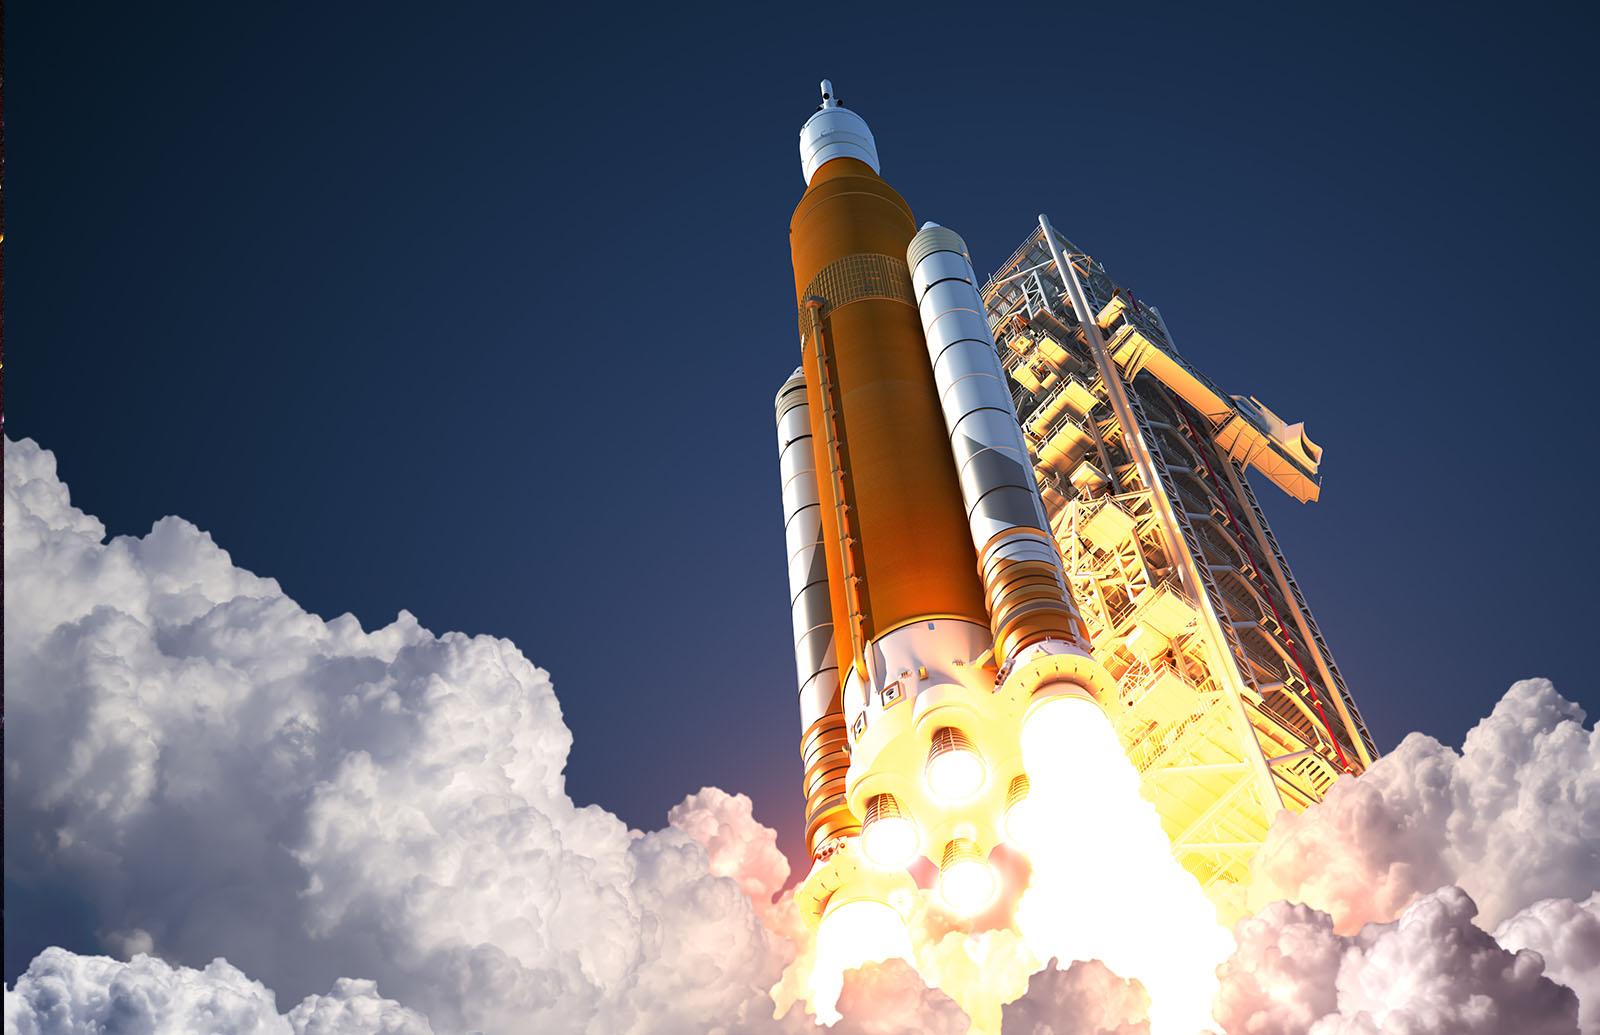 NASA's SLS rocket test wasn't a great look